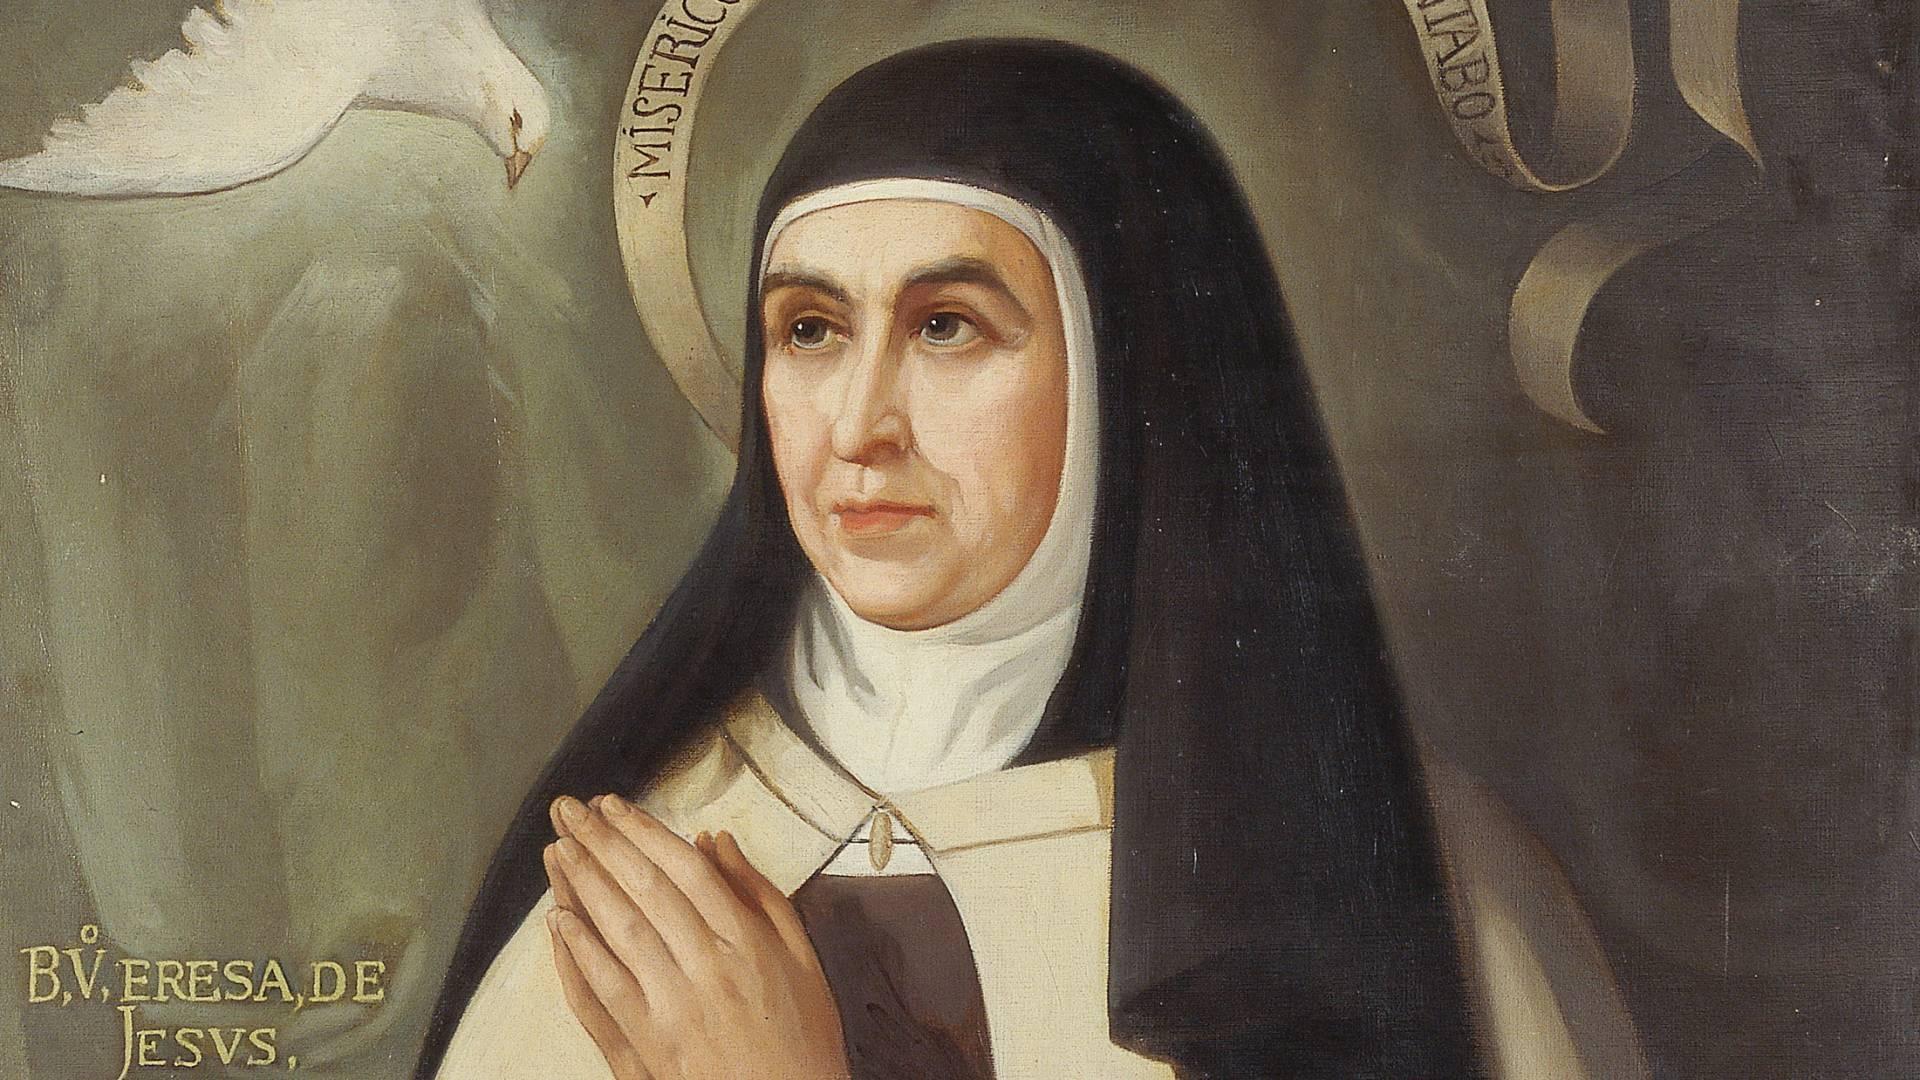 Deacon-structing St. Teresa's Stages of Prayer, Part 1